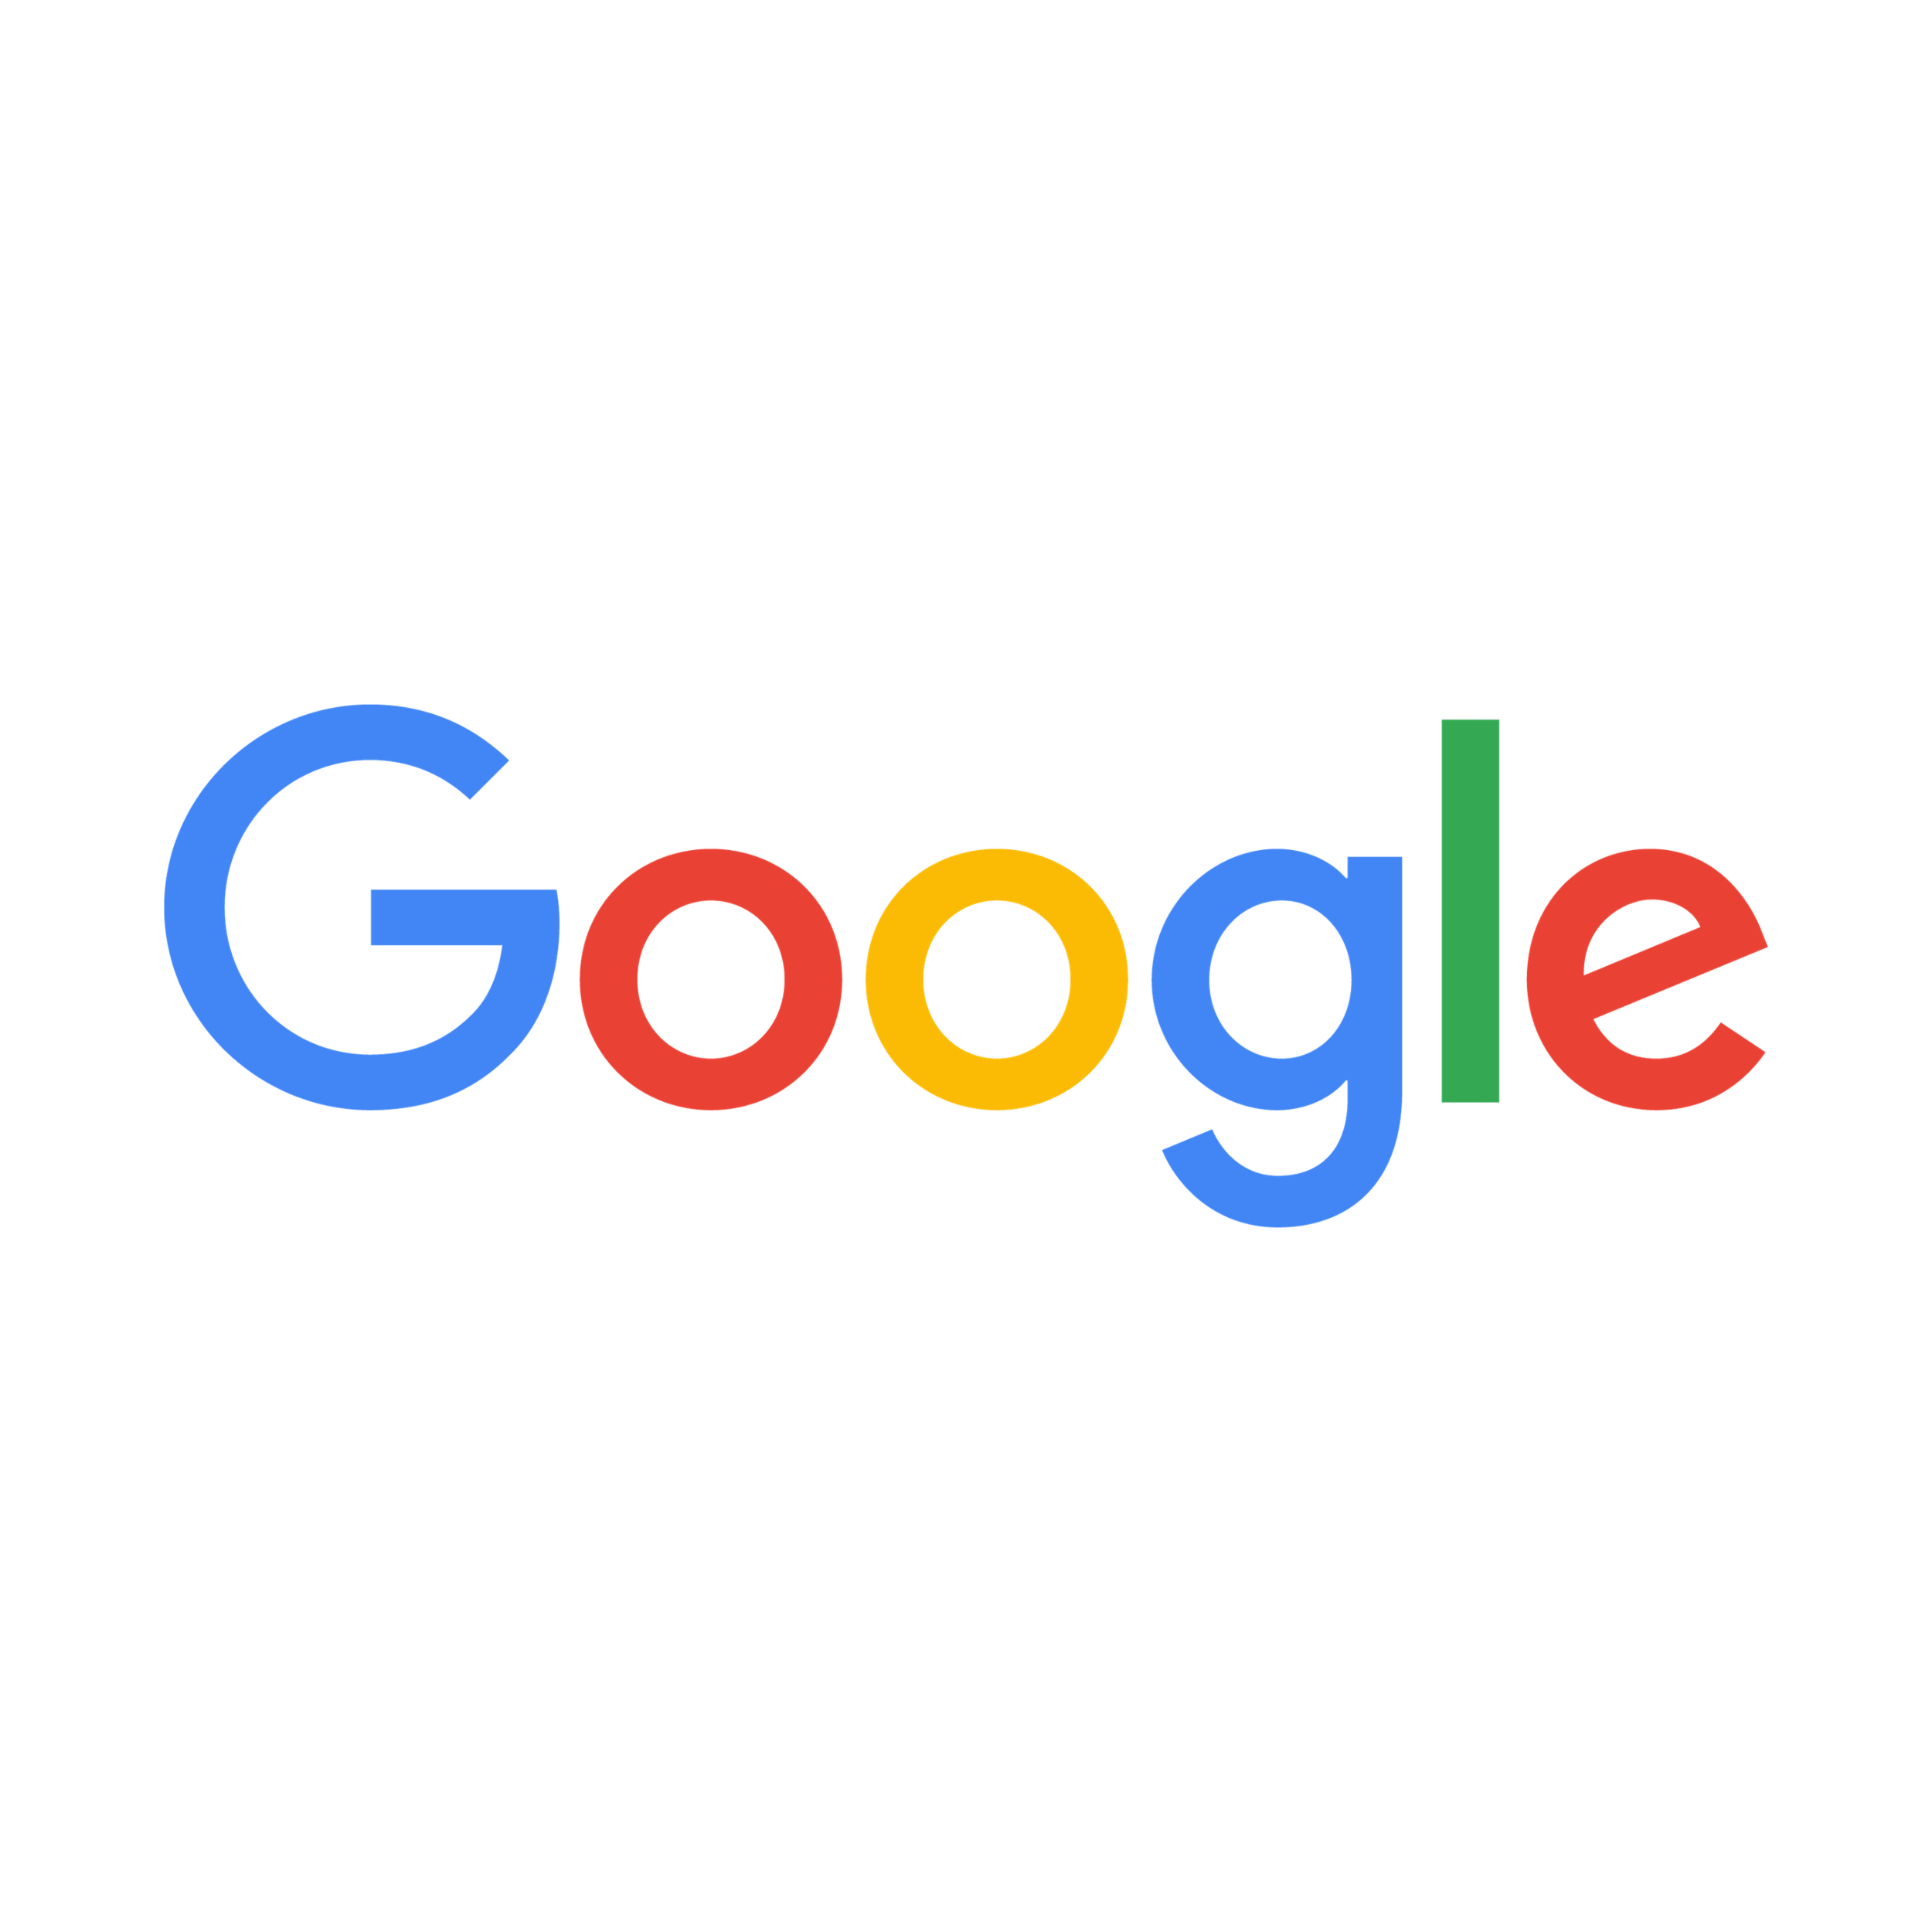 logo_Google_FullColor_3x_830x271px.max-2800x2800-min.png